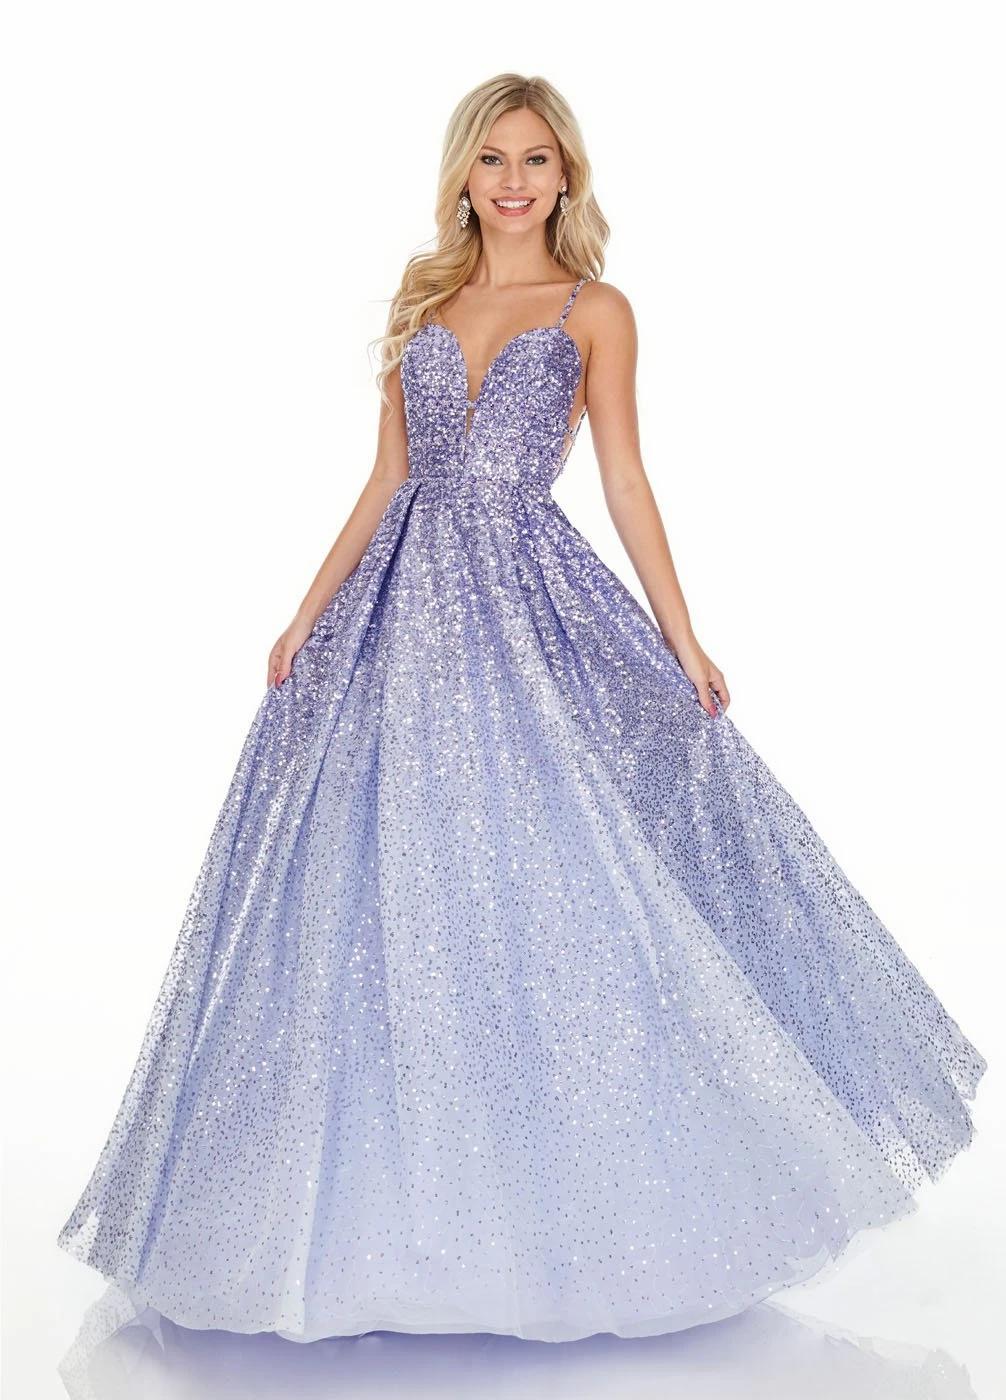 rachel-allan-7107-1-prom-dresses_2048x